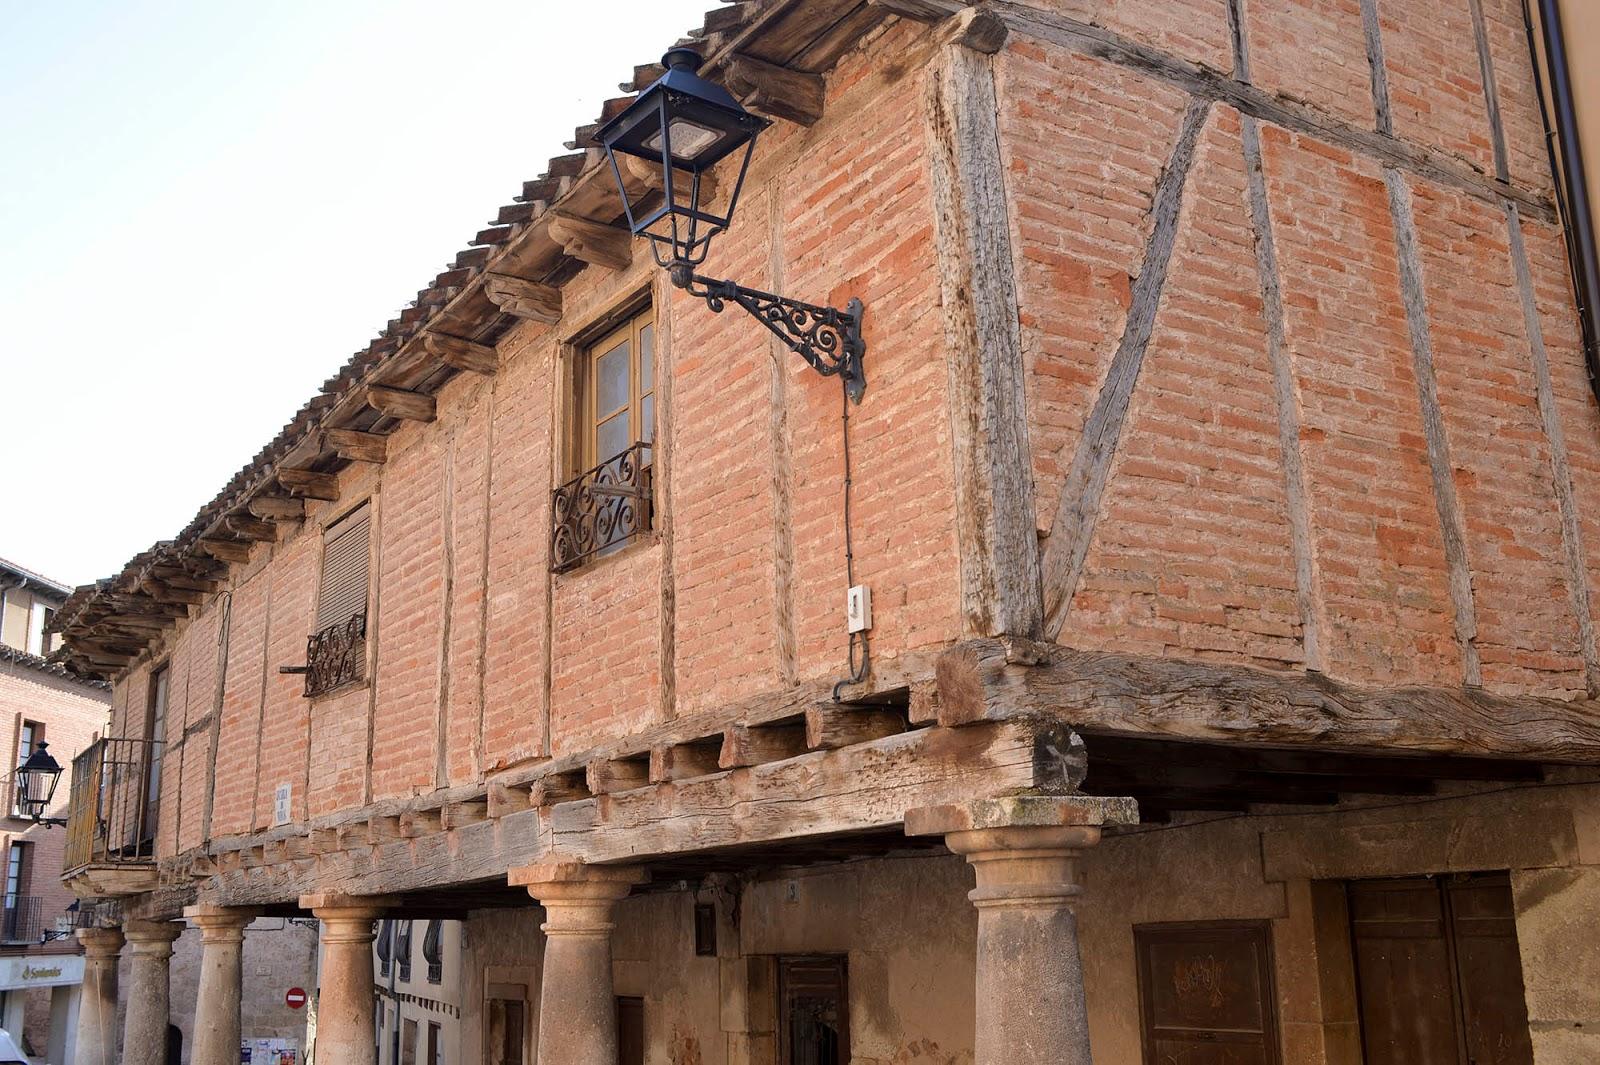 lerma burgos spain castile leon typical house construction beautiful village